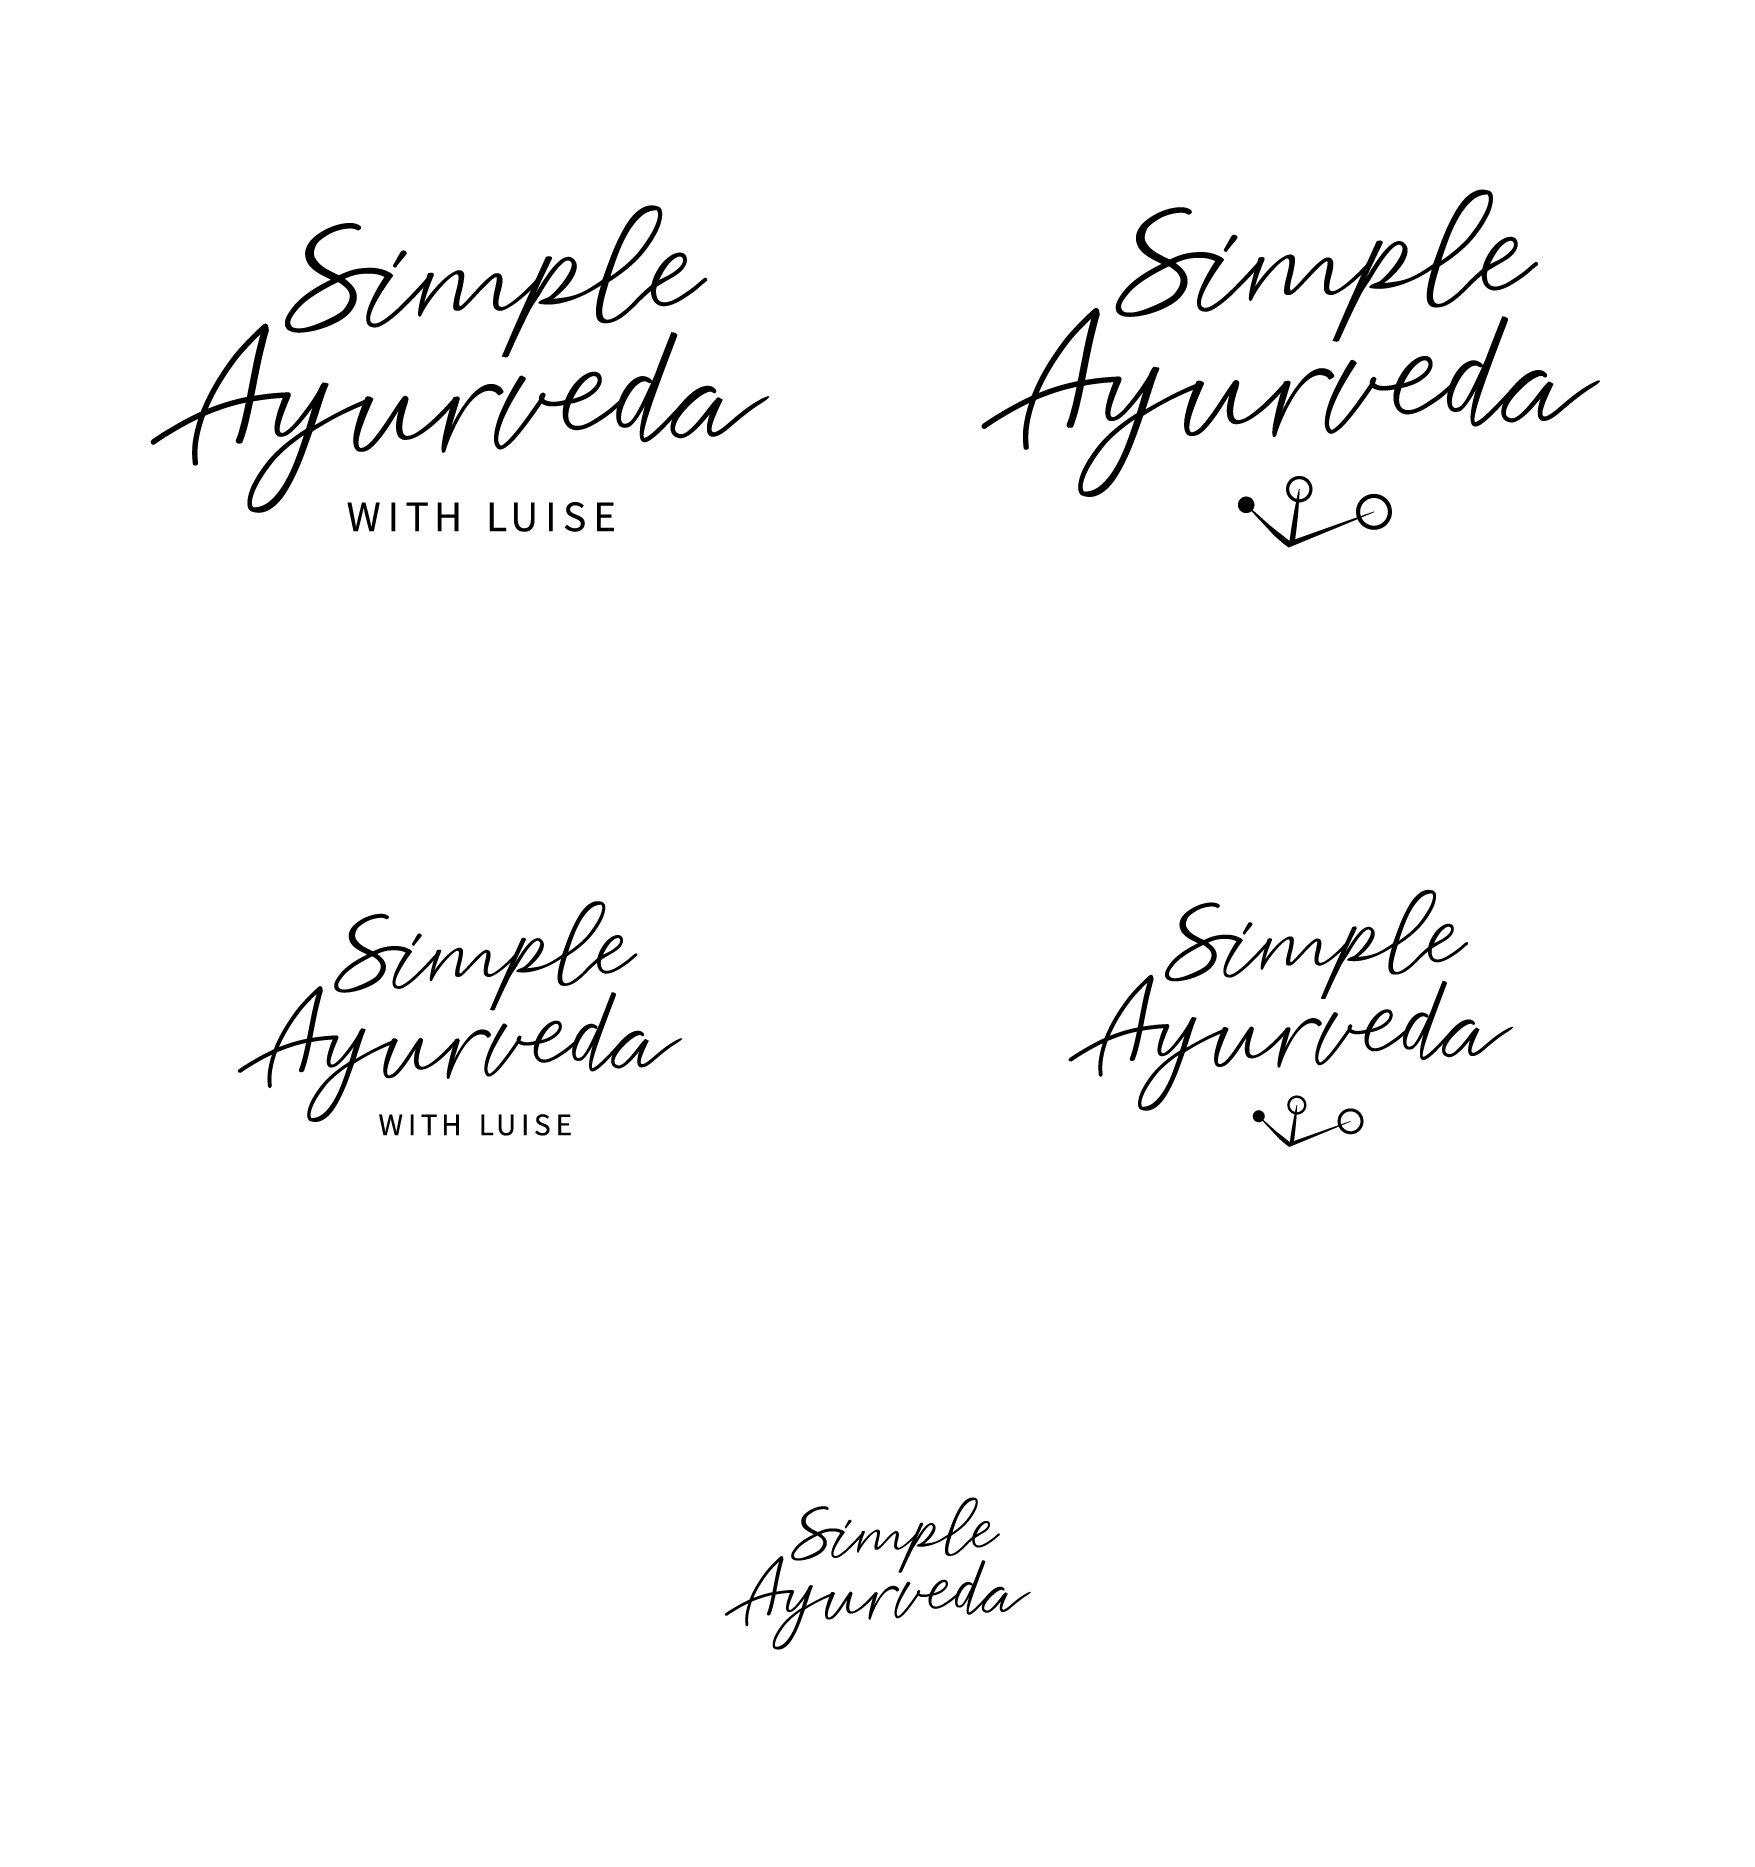 Simply Ayurveda presentation-04.jpg